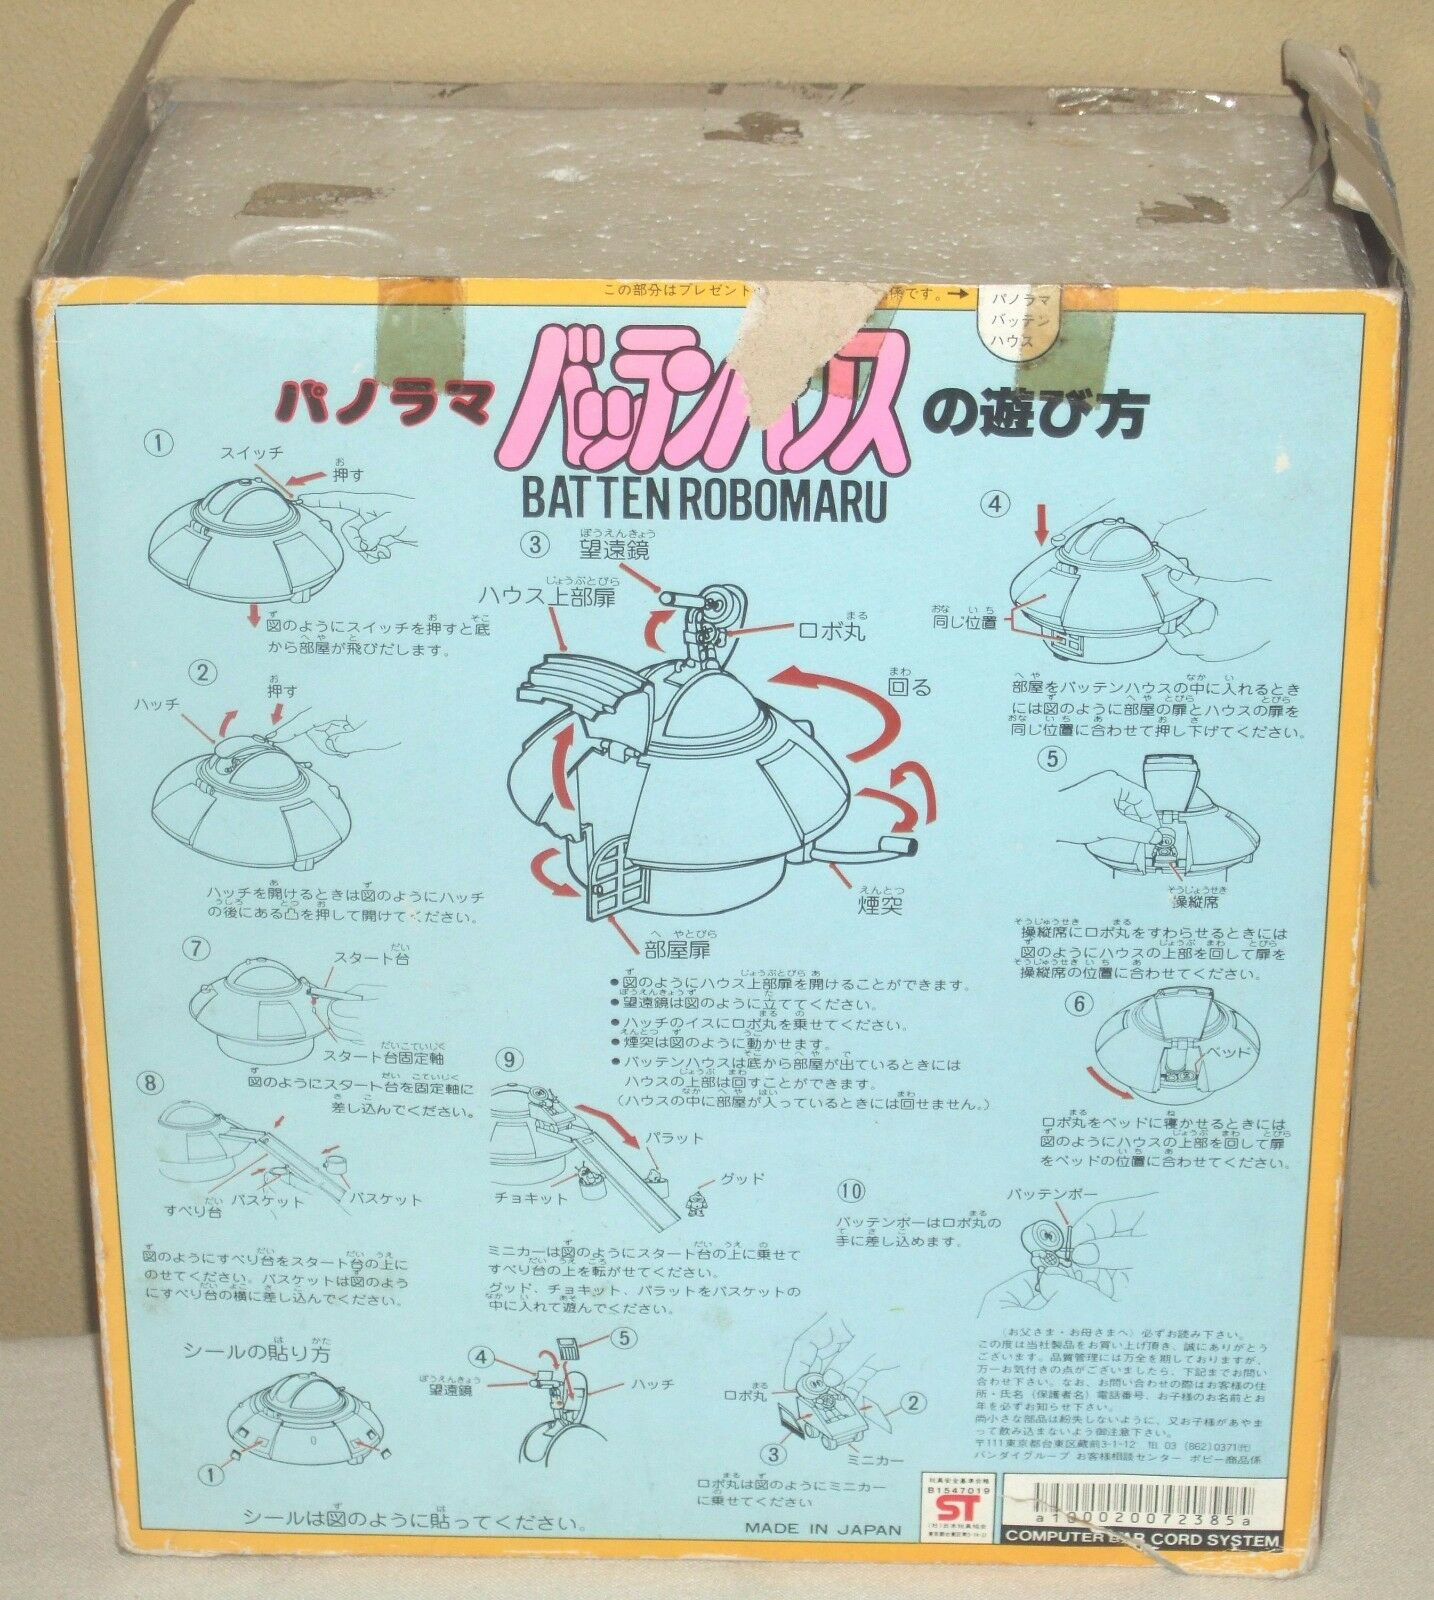 Robot Robomaru Batten House Saucer Figure Dolls 7.7 7.7 7.7 19.5cm Popy 1983 Used Rare 2cffec